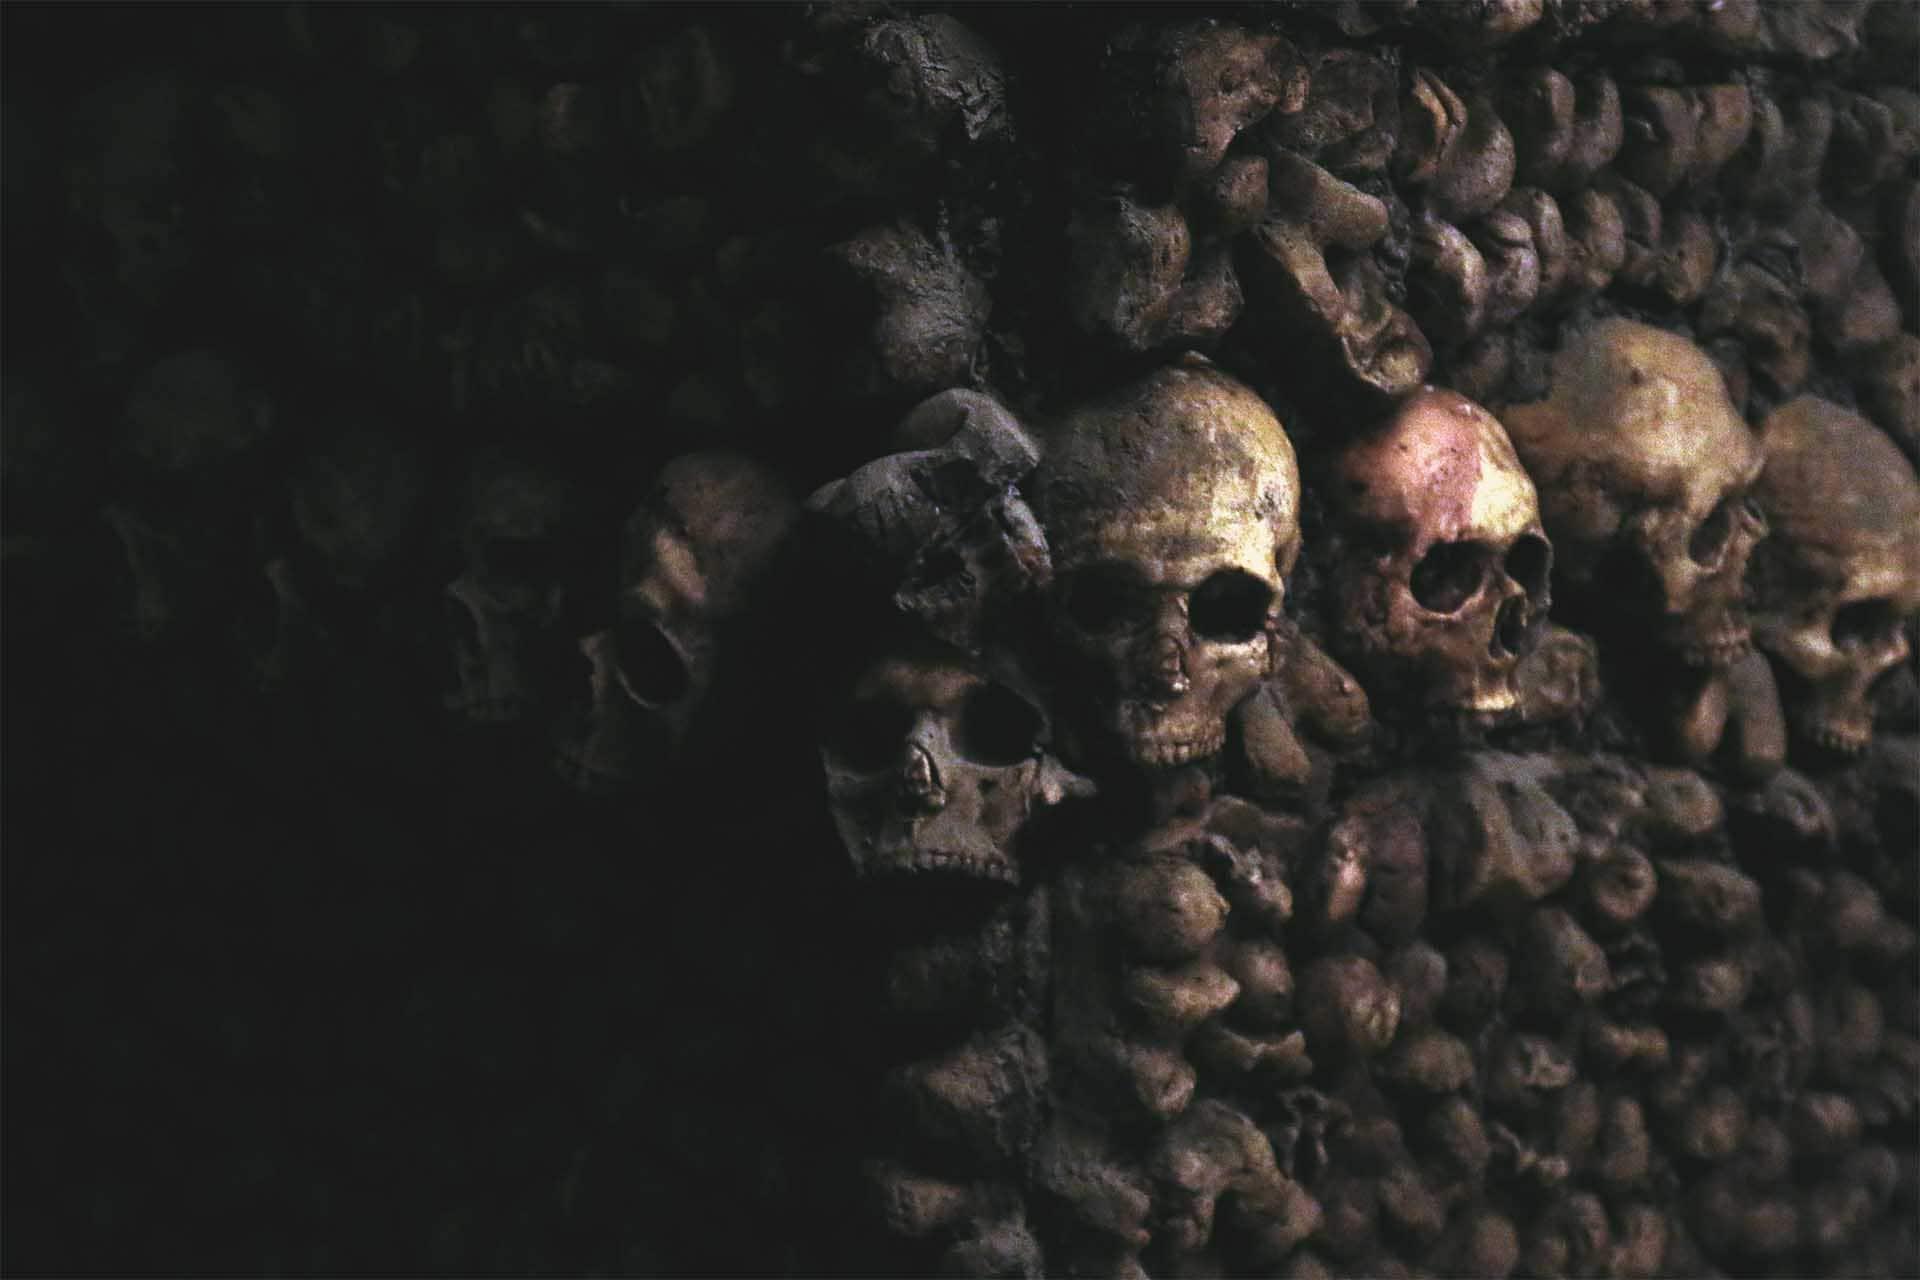 Catacombs - Episode 8